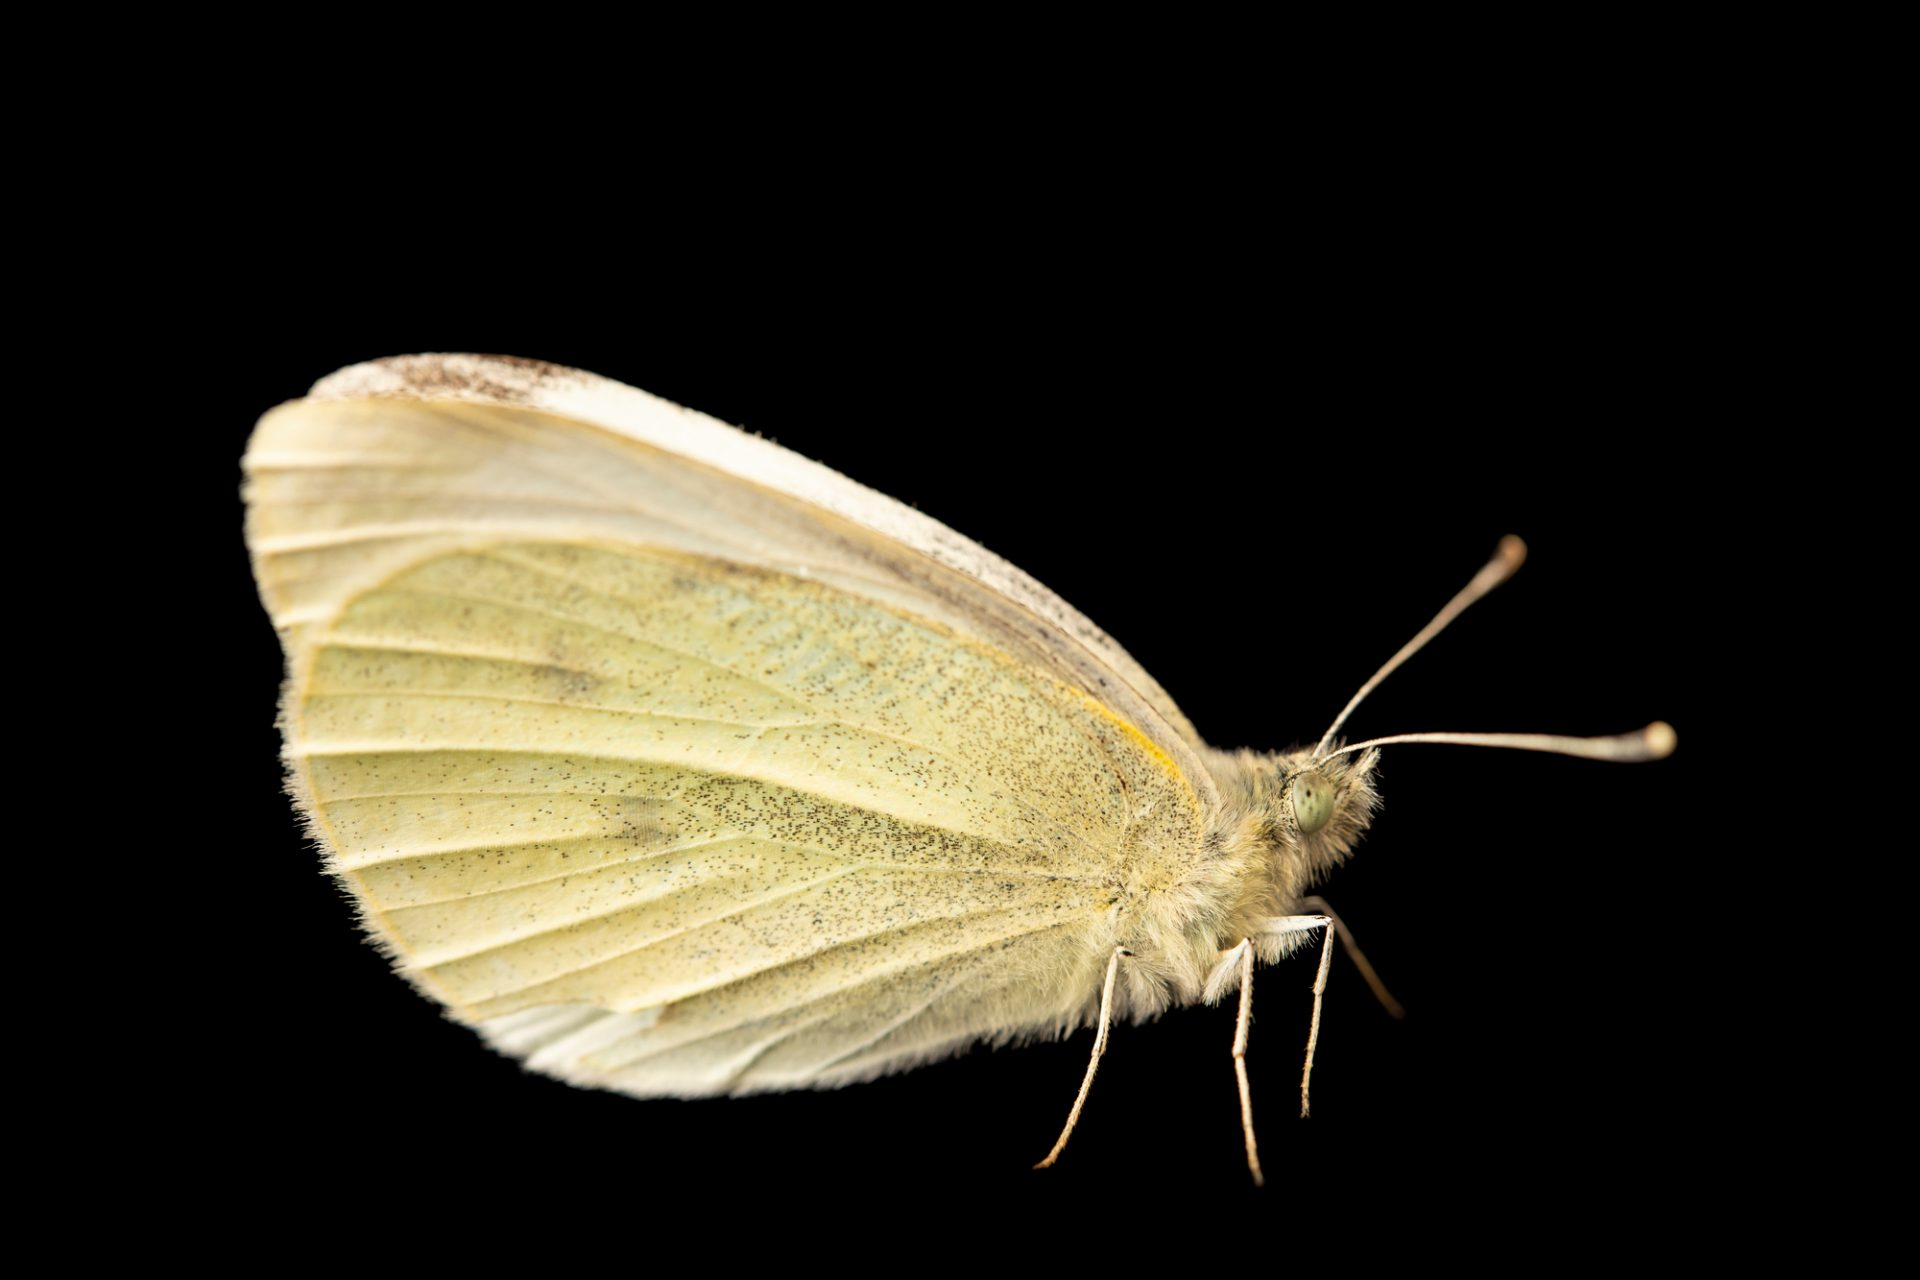 Photo: Small white butterfly (Pieris rapae) at Graham's Quinta dos Malvedos Vineyard.